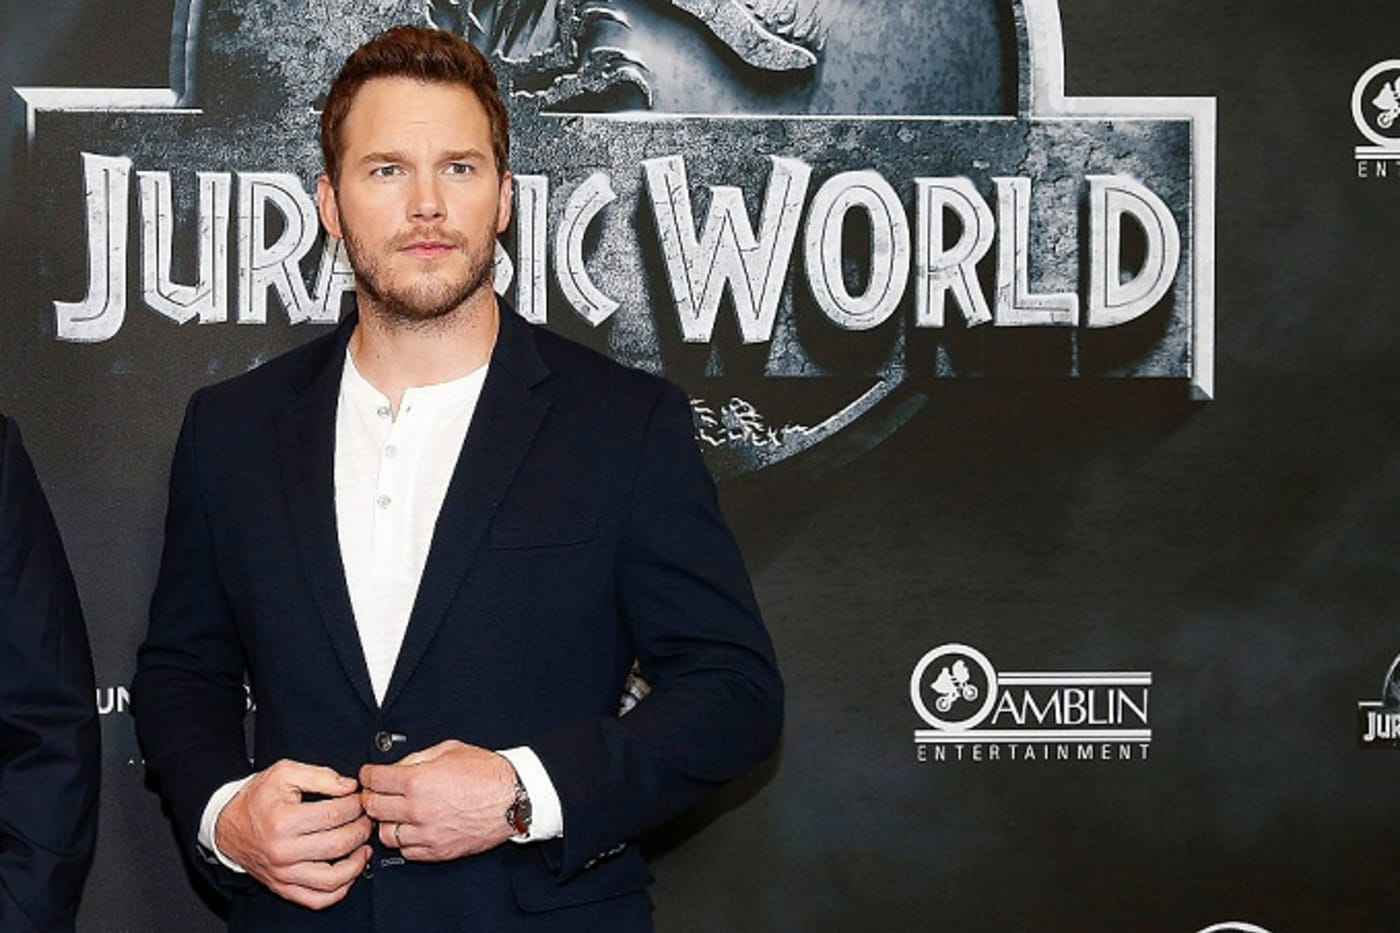 Chris Pratt of 'Jurassic World'